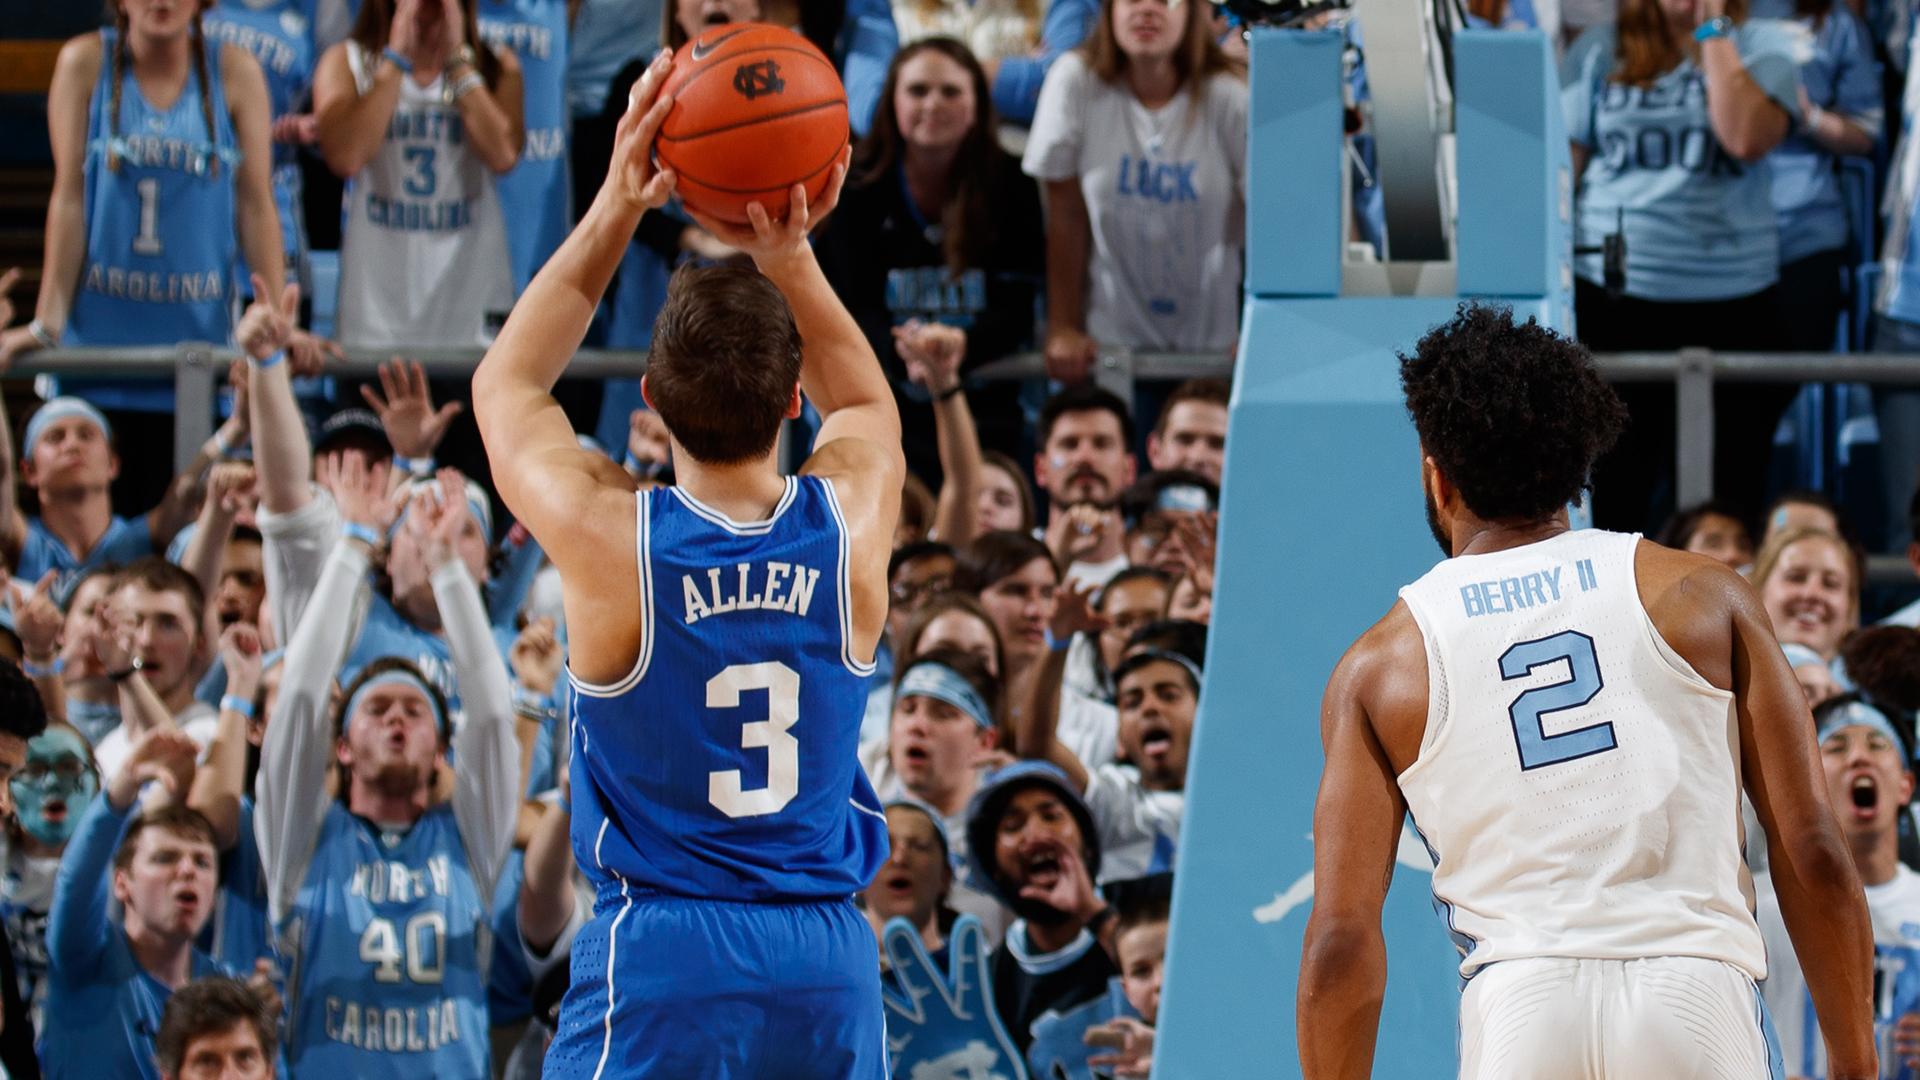 UNC Recruiting: Five-star c/o 2019 prospect to attend Duke, North Carolina game